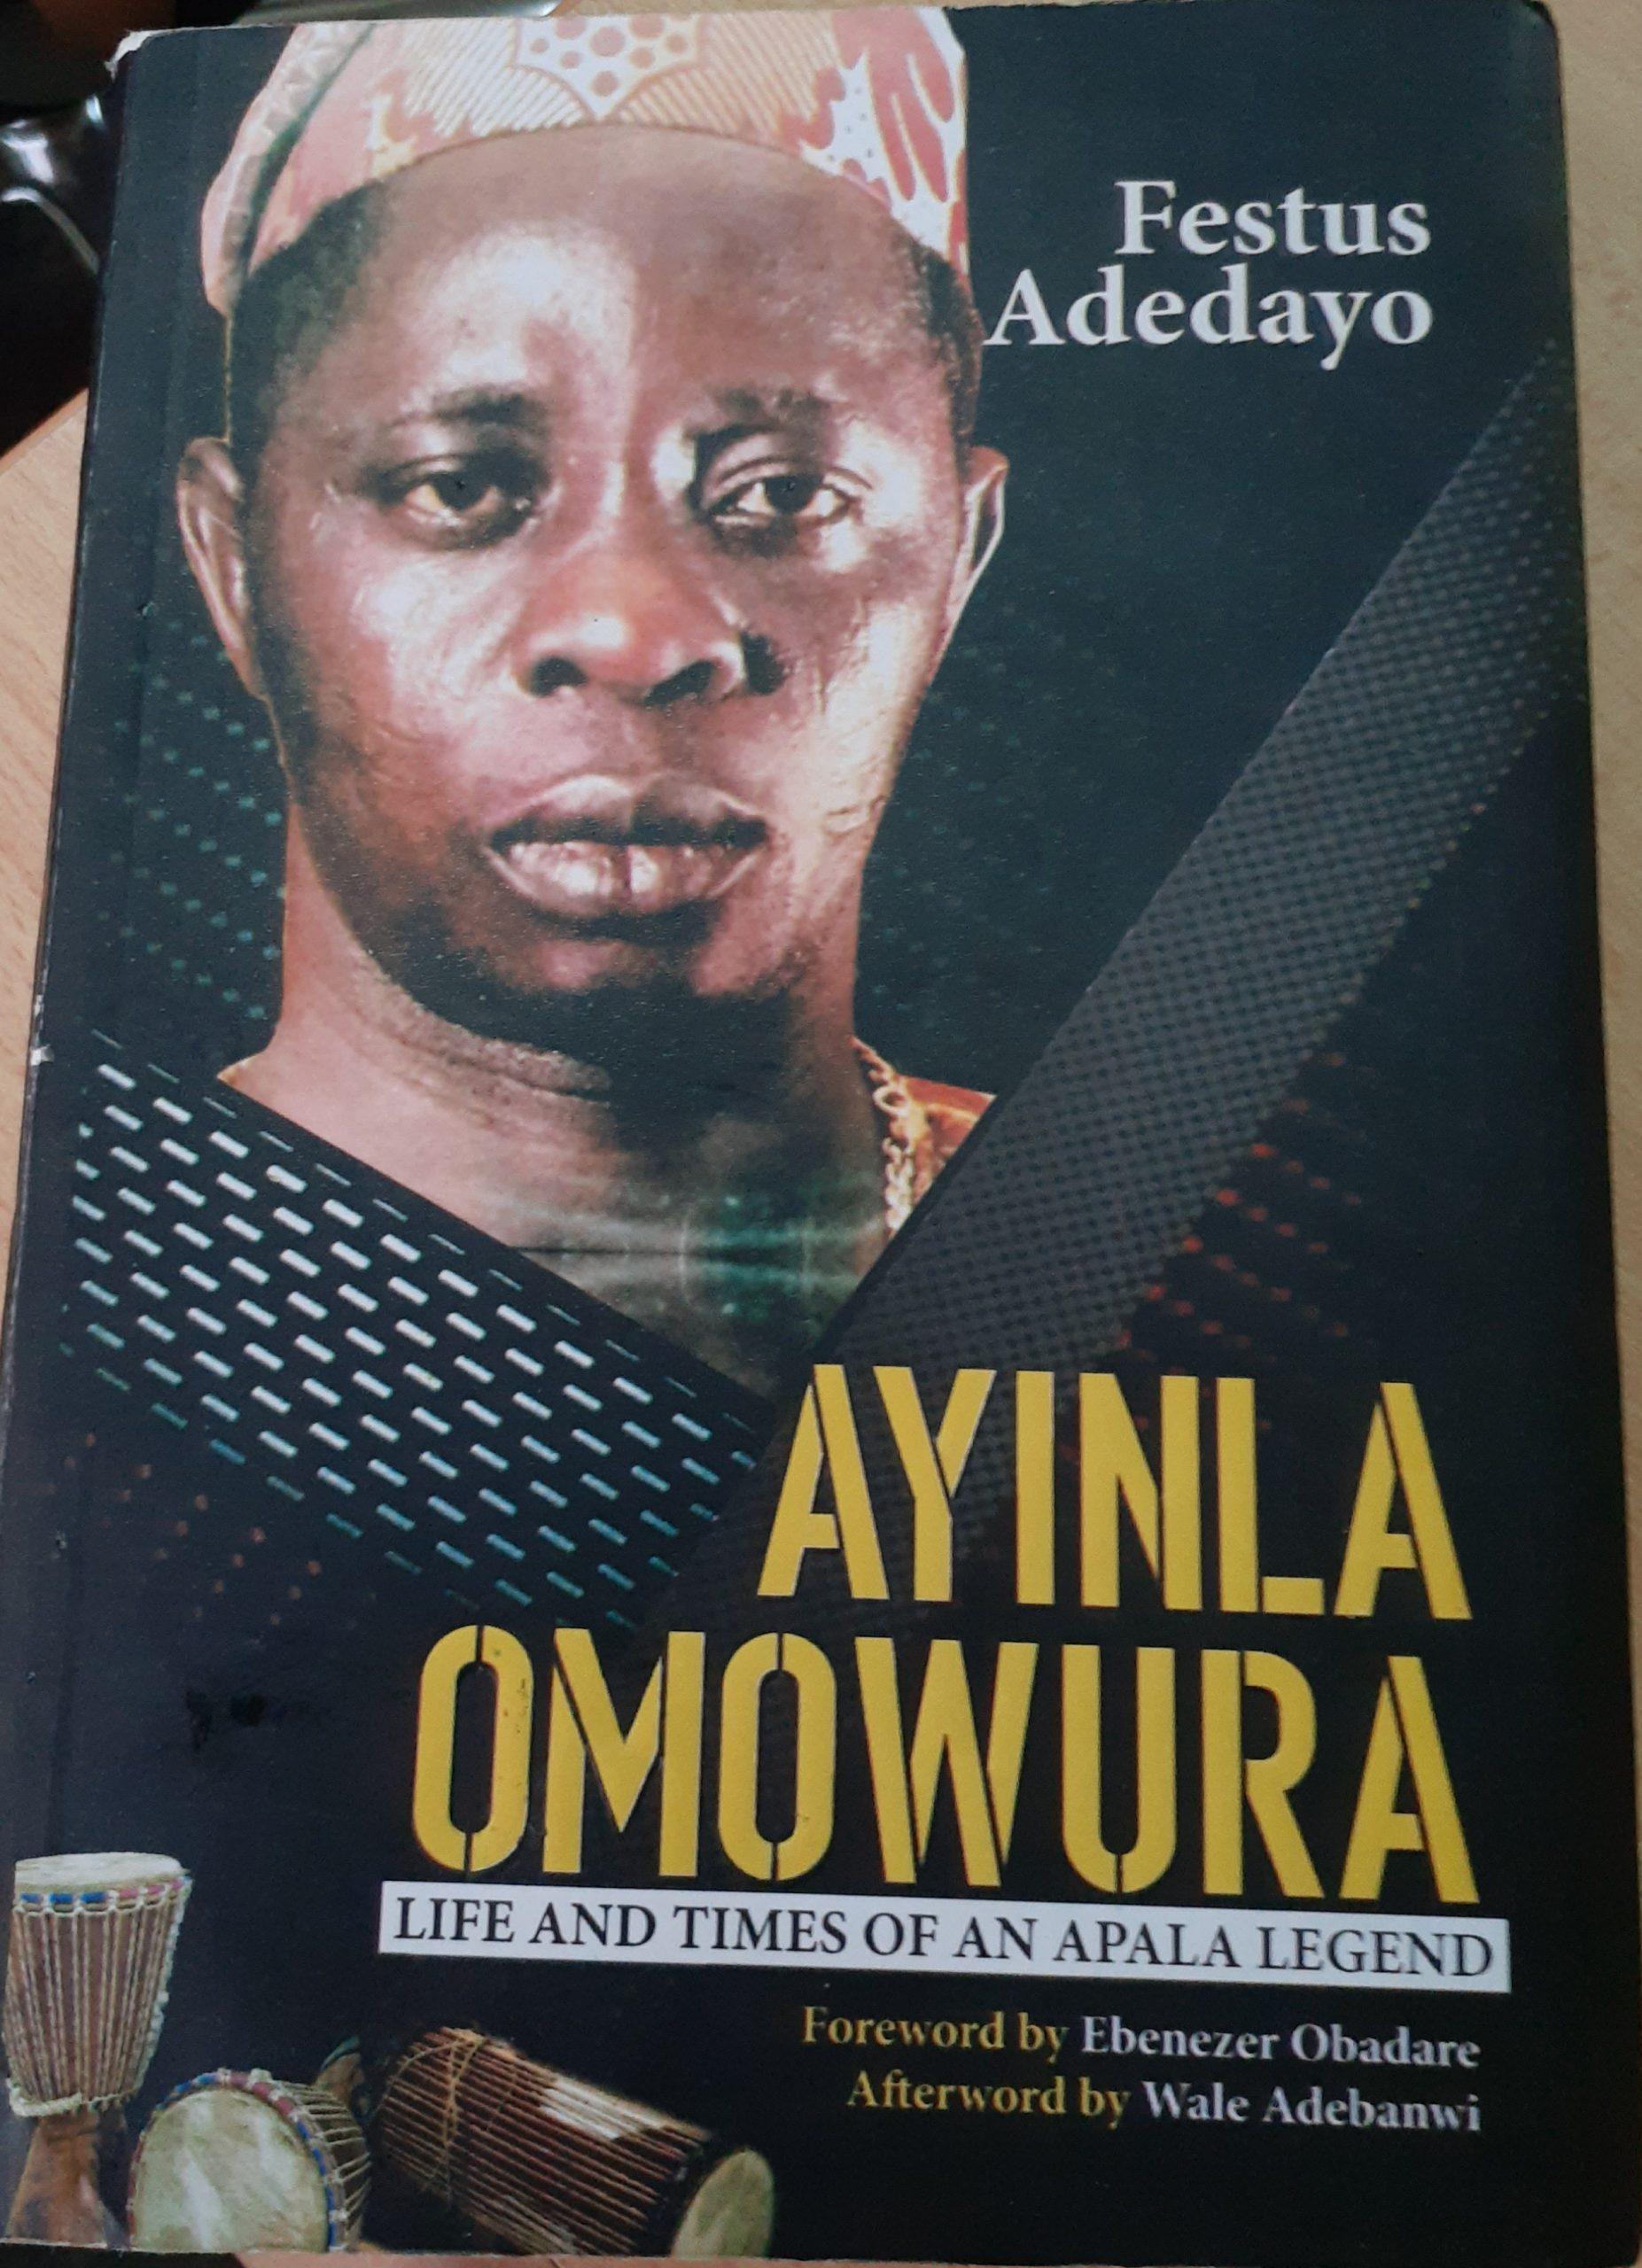 AYINLA BOOK COVER